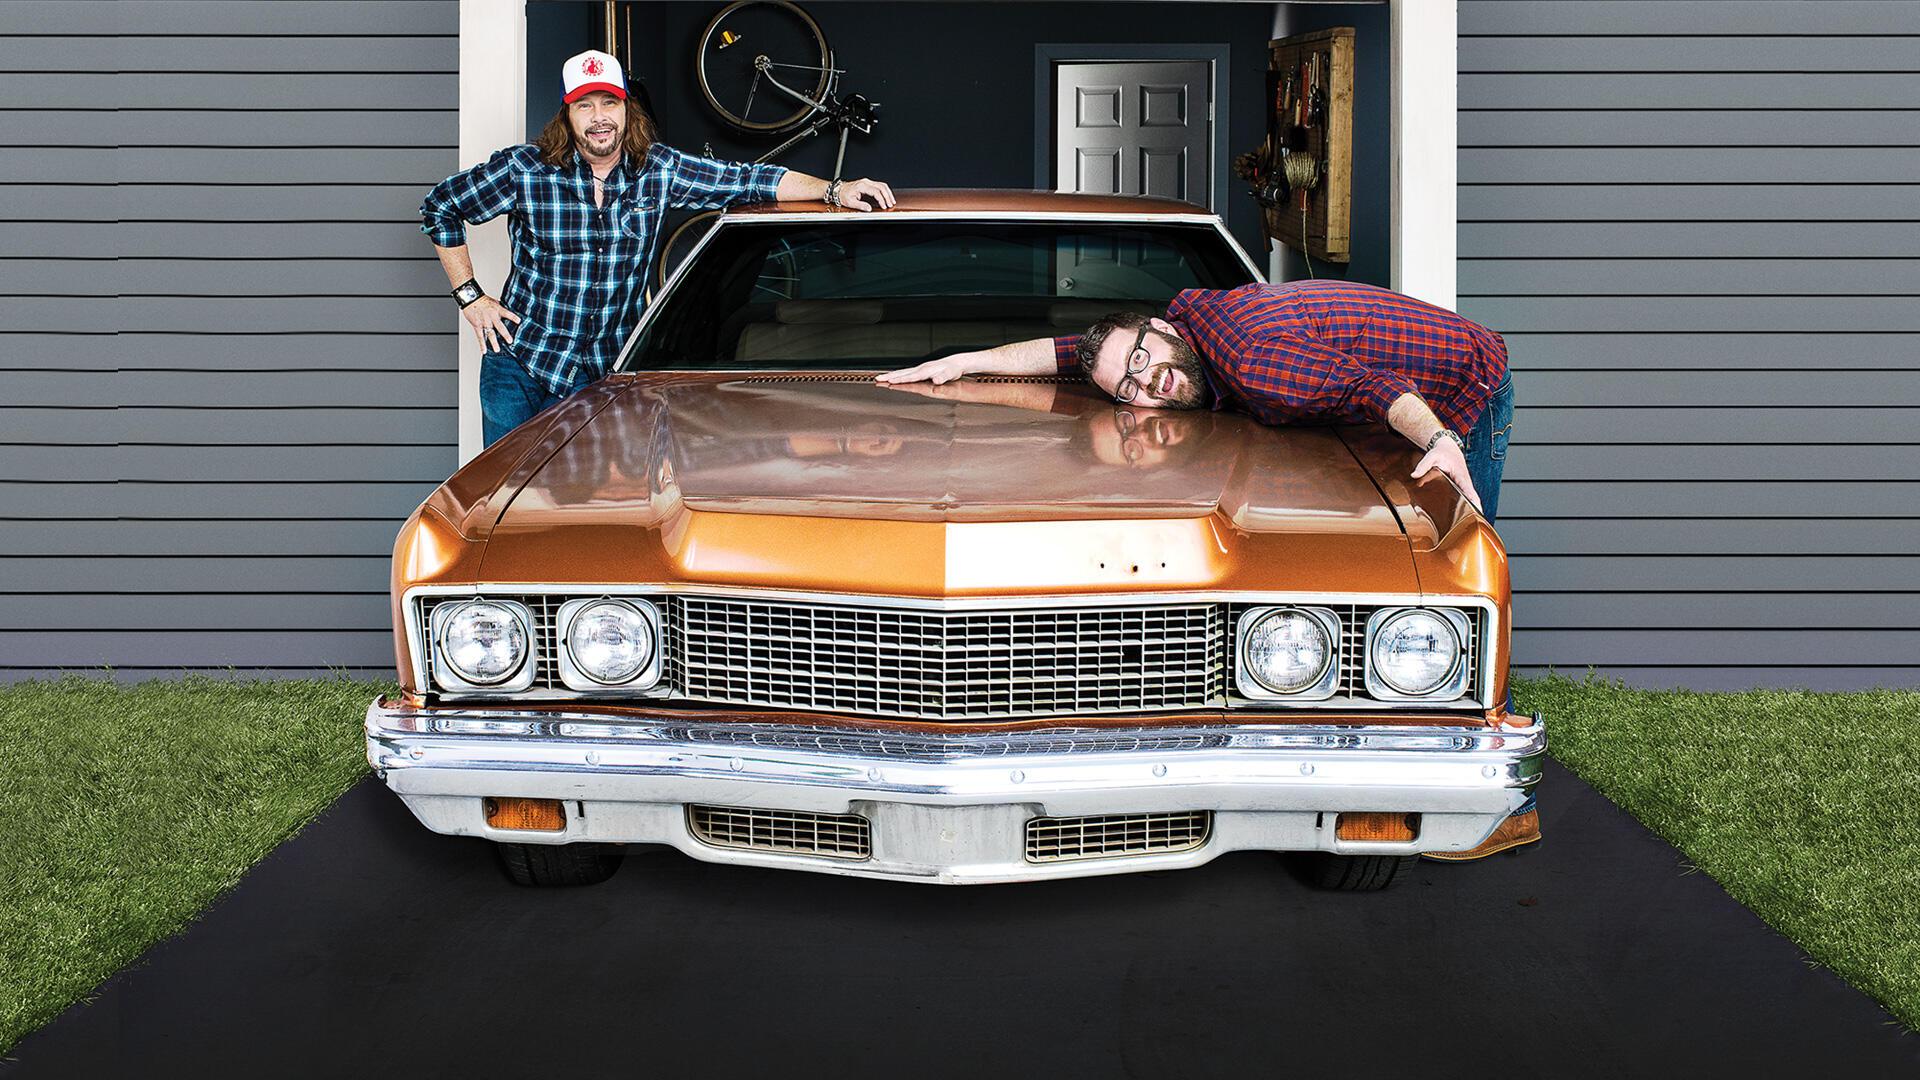 My Favorite American Cars